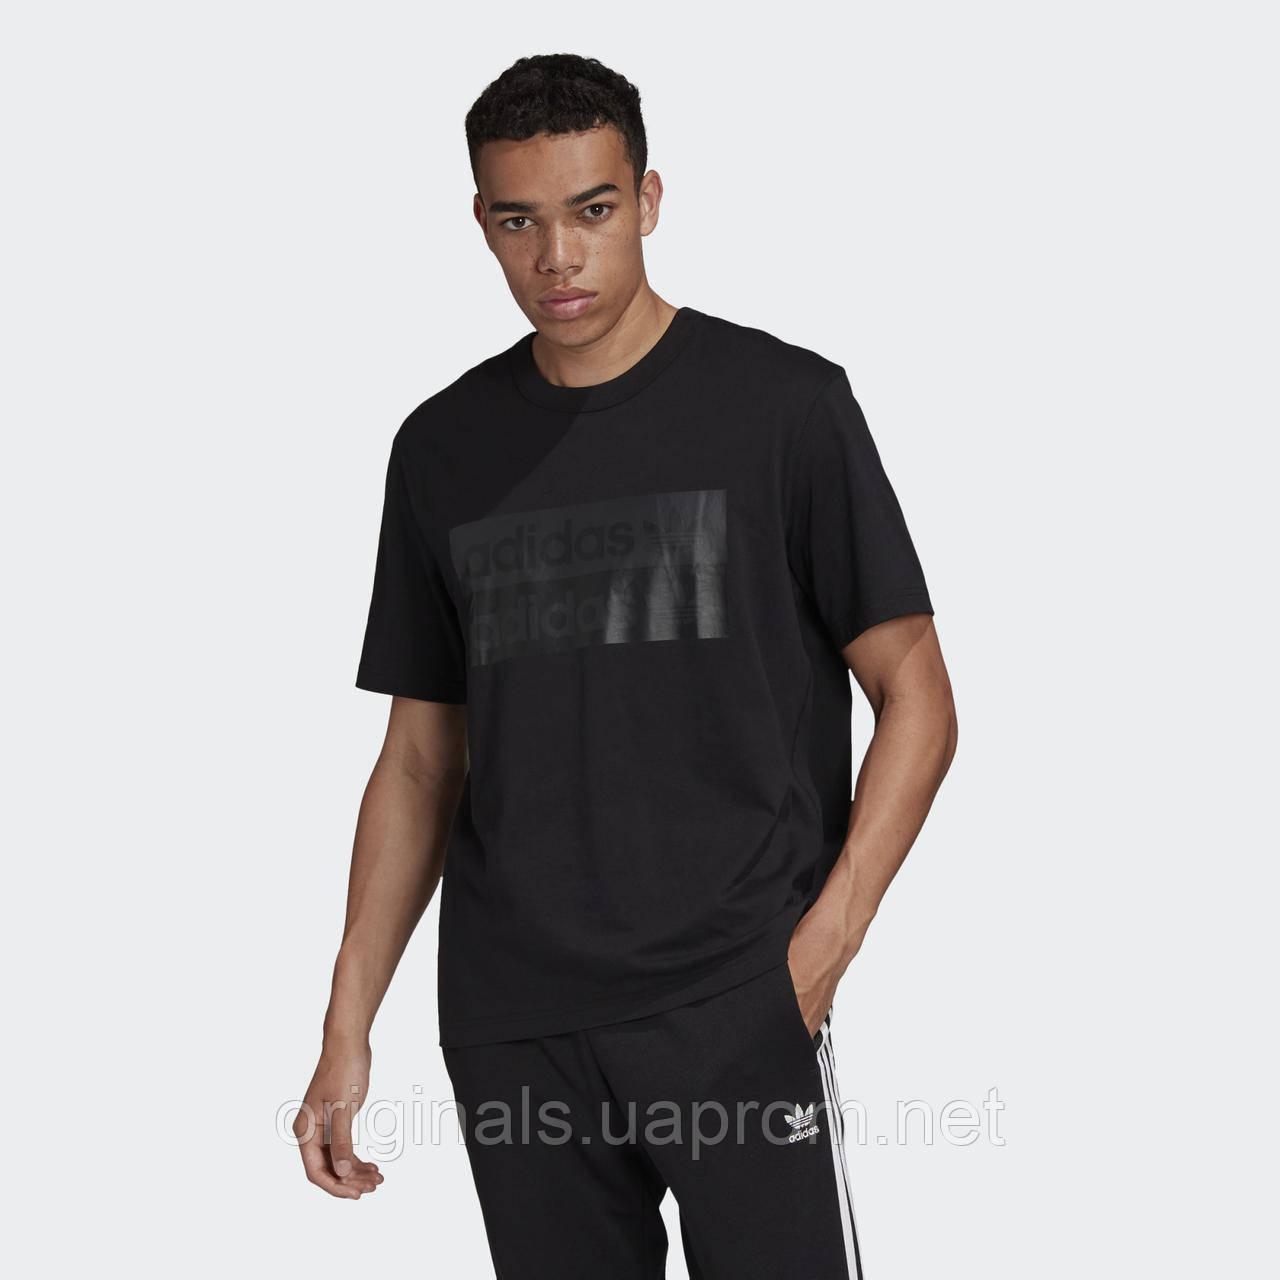 Мужская футболка adidas R.Y.V. Graphic Tee FM2291 2020